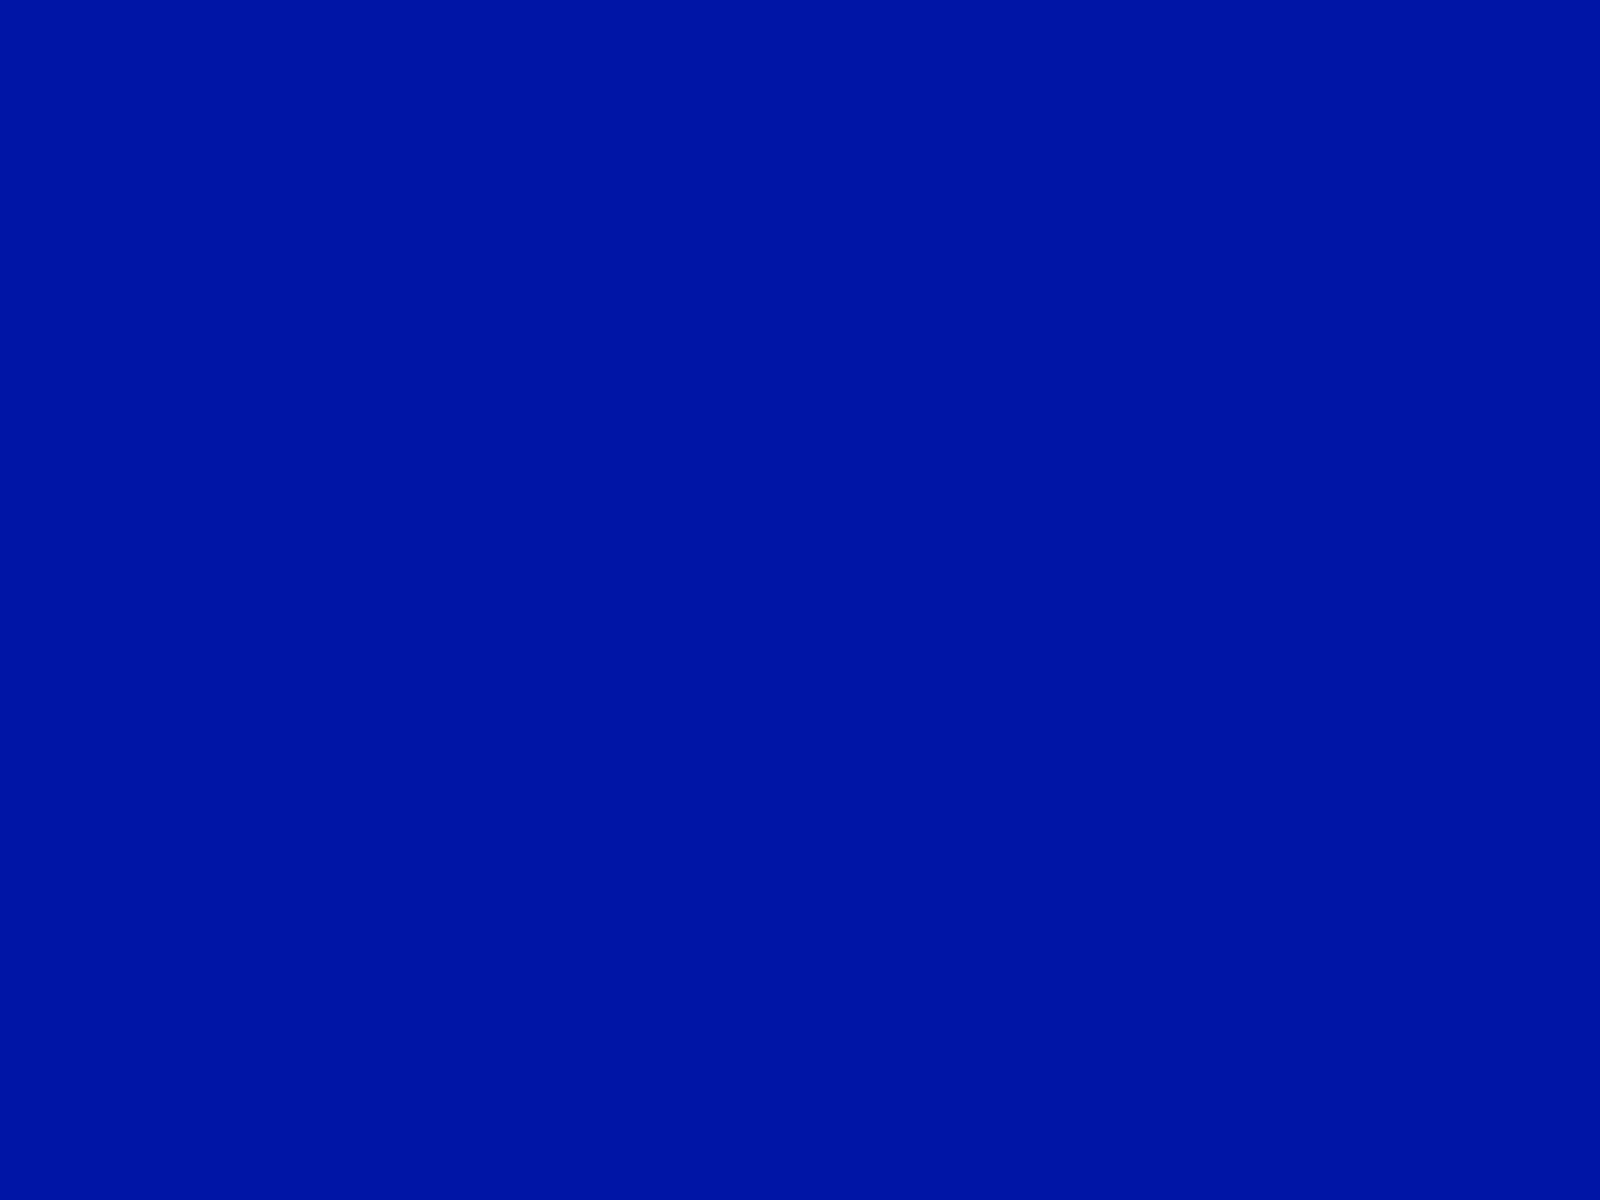 1600x1200 Zaffre Solid Color Background